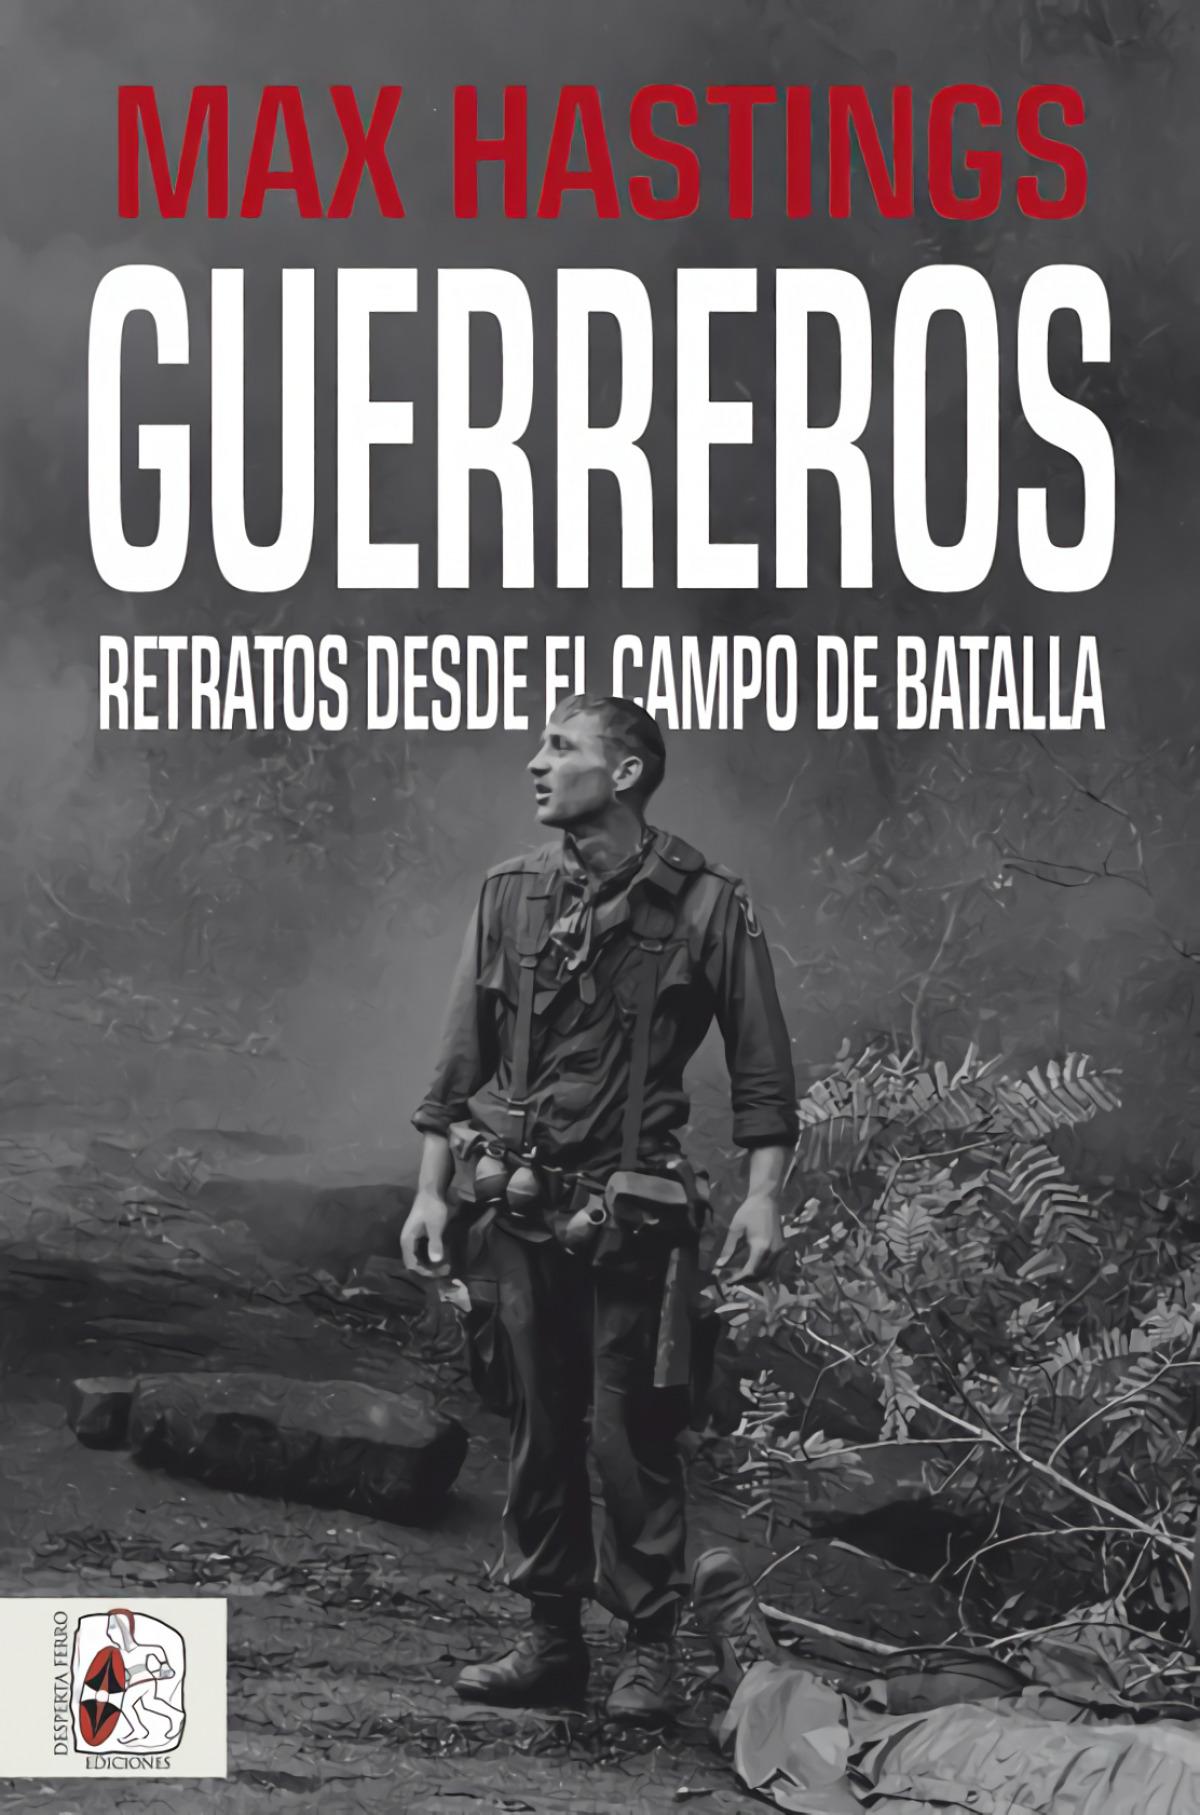 Guerreros 9788412105339